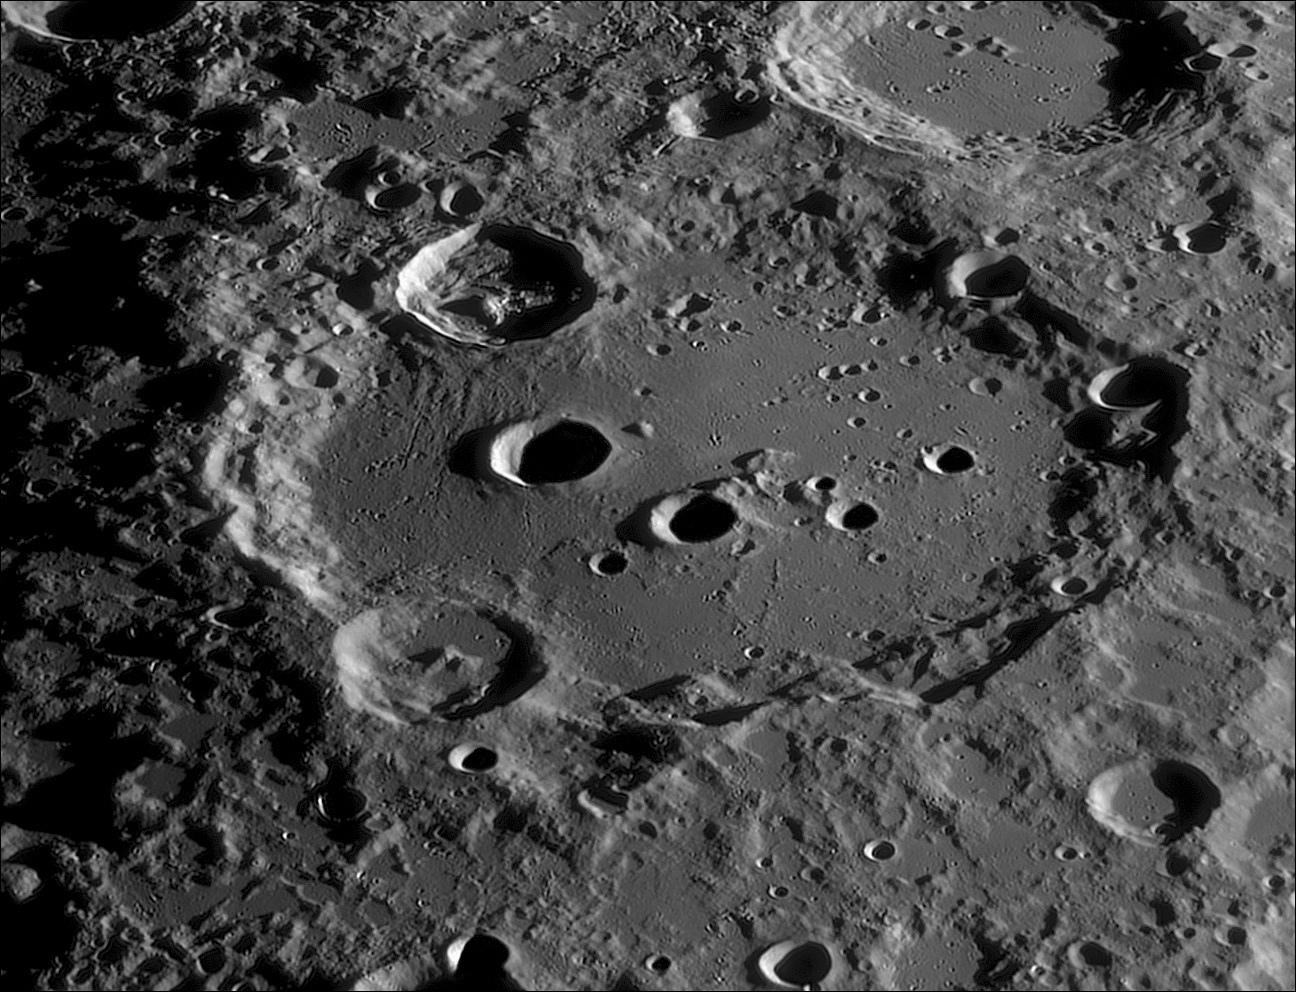 Ptolémée 650 images  ondelettes V 210  Bonne image traitée BV.jpg